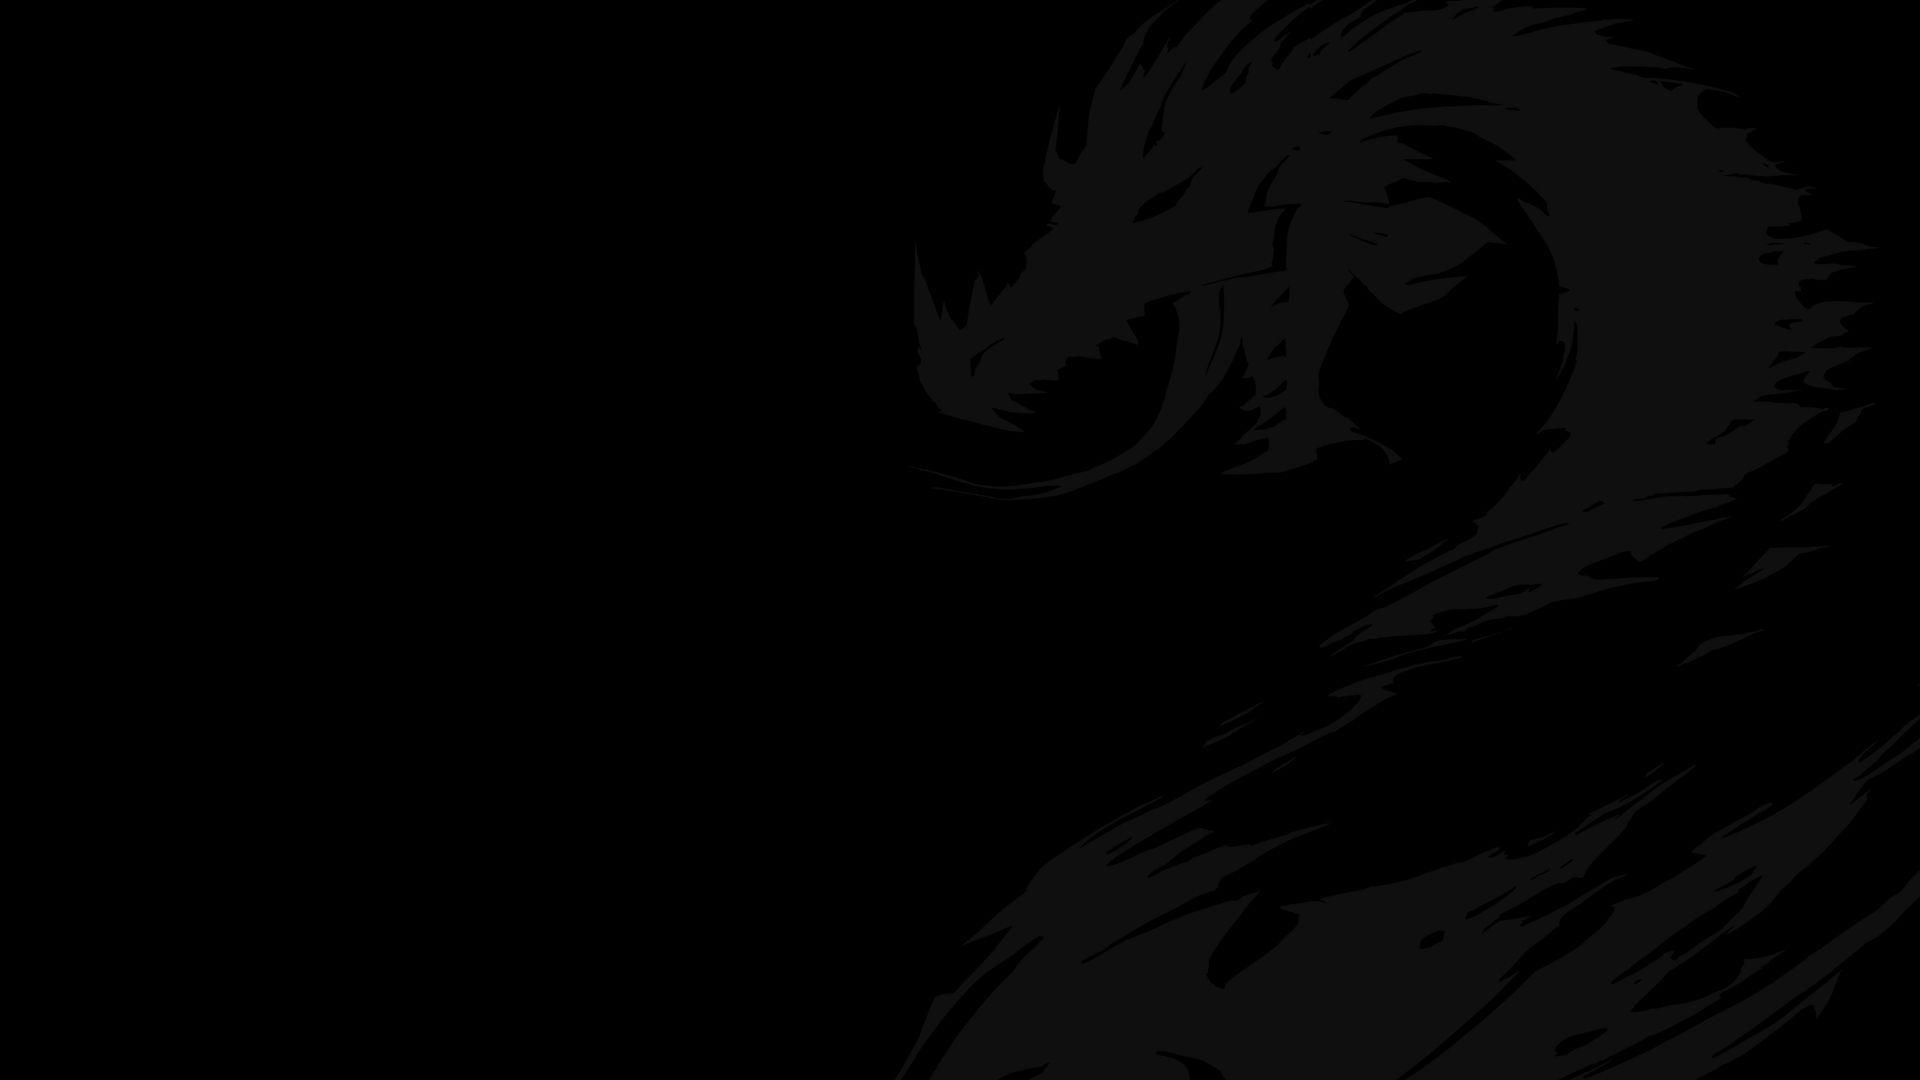 Black Dragon Wallpapers Hd Wallpaper Cave